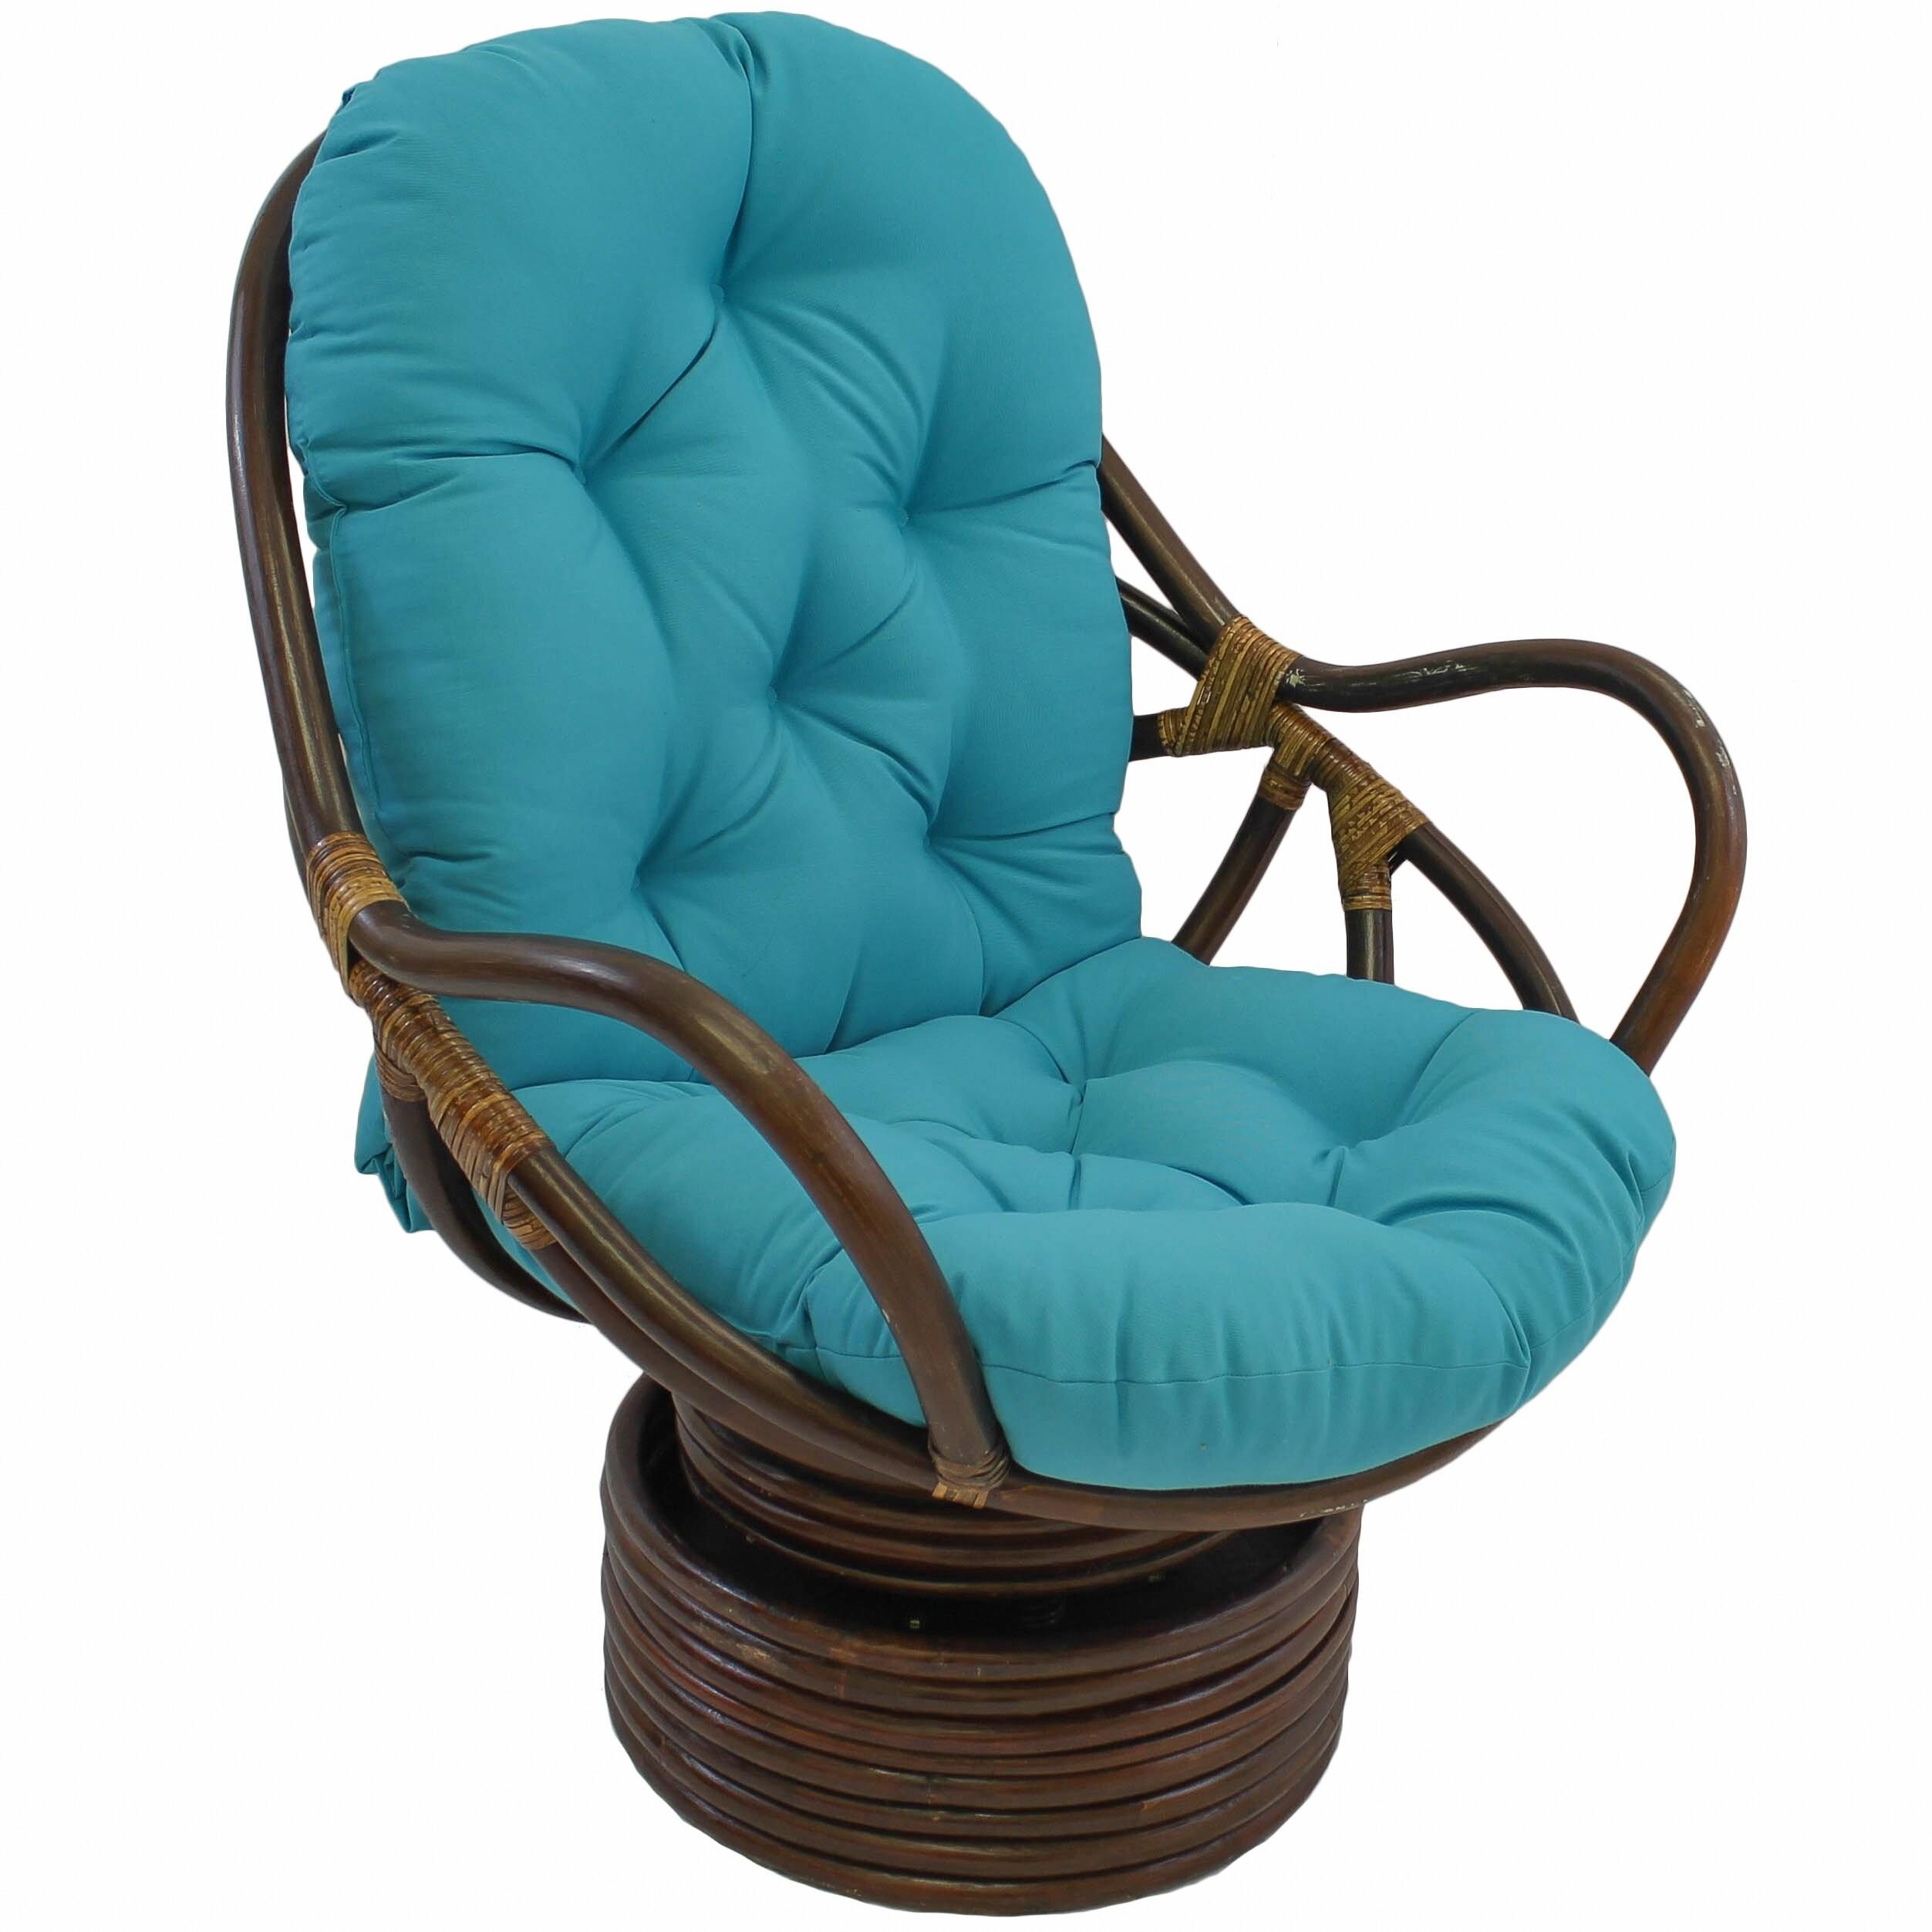 Rattan Swivel Rocker Replacement Cushion